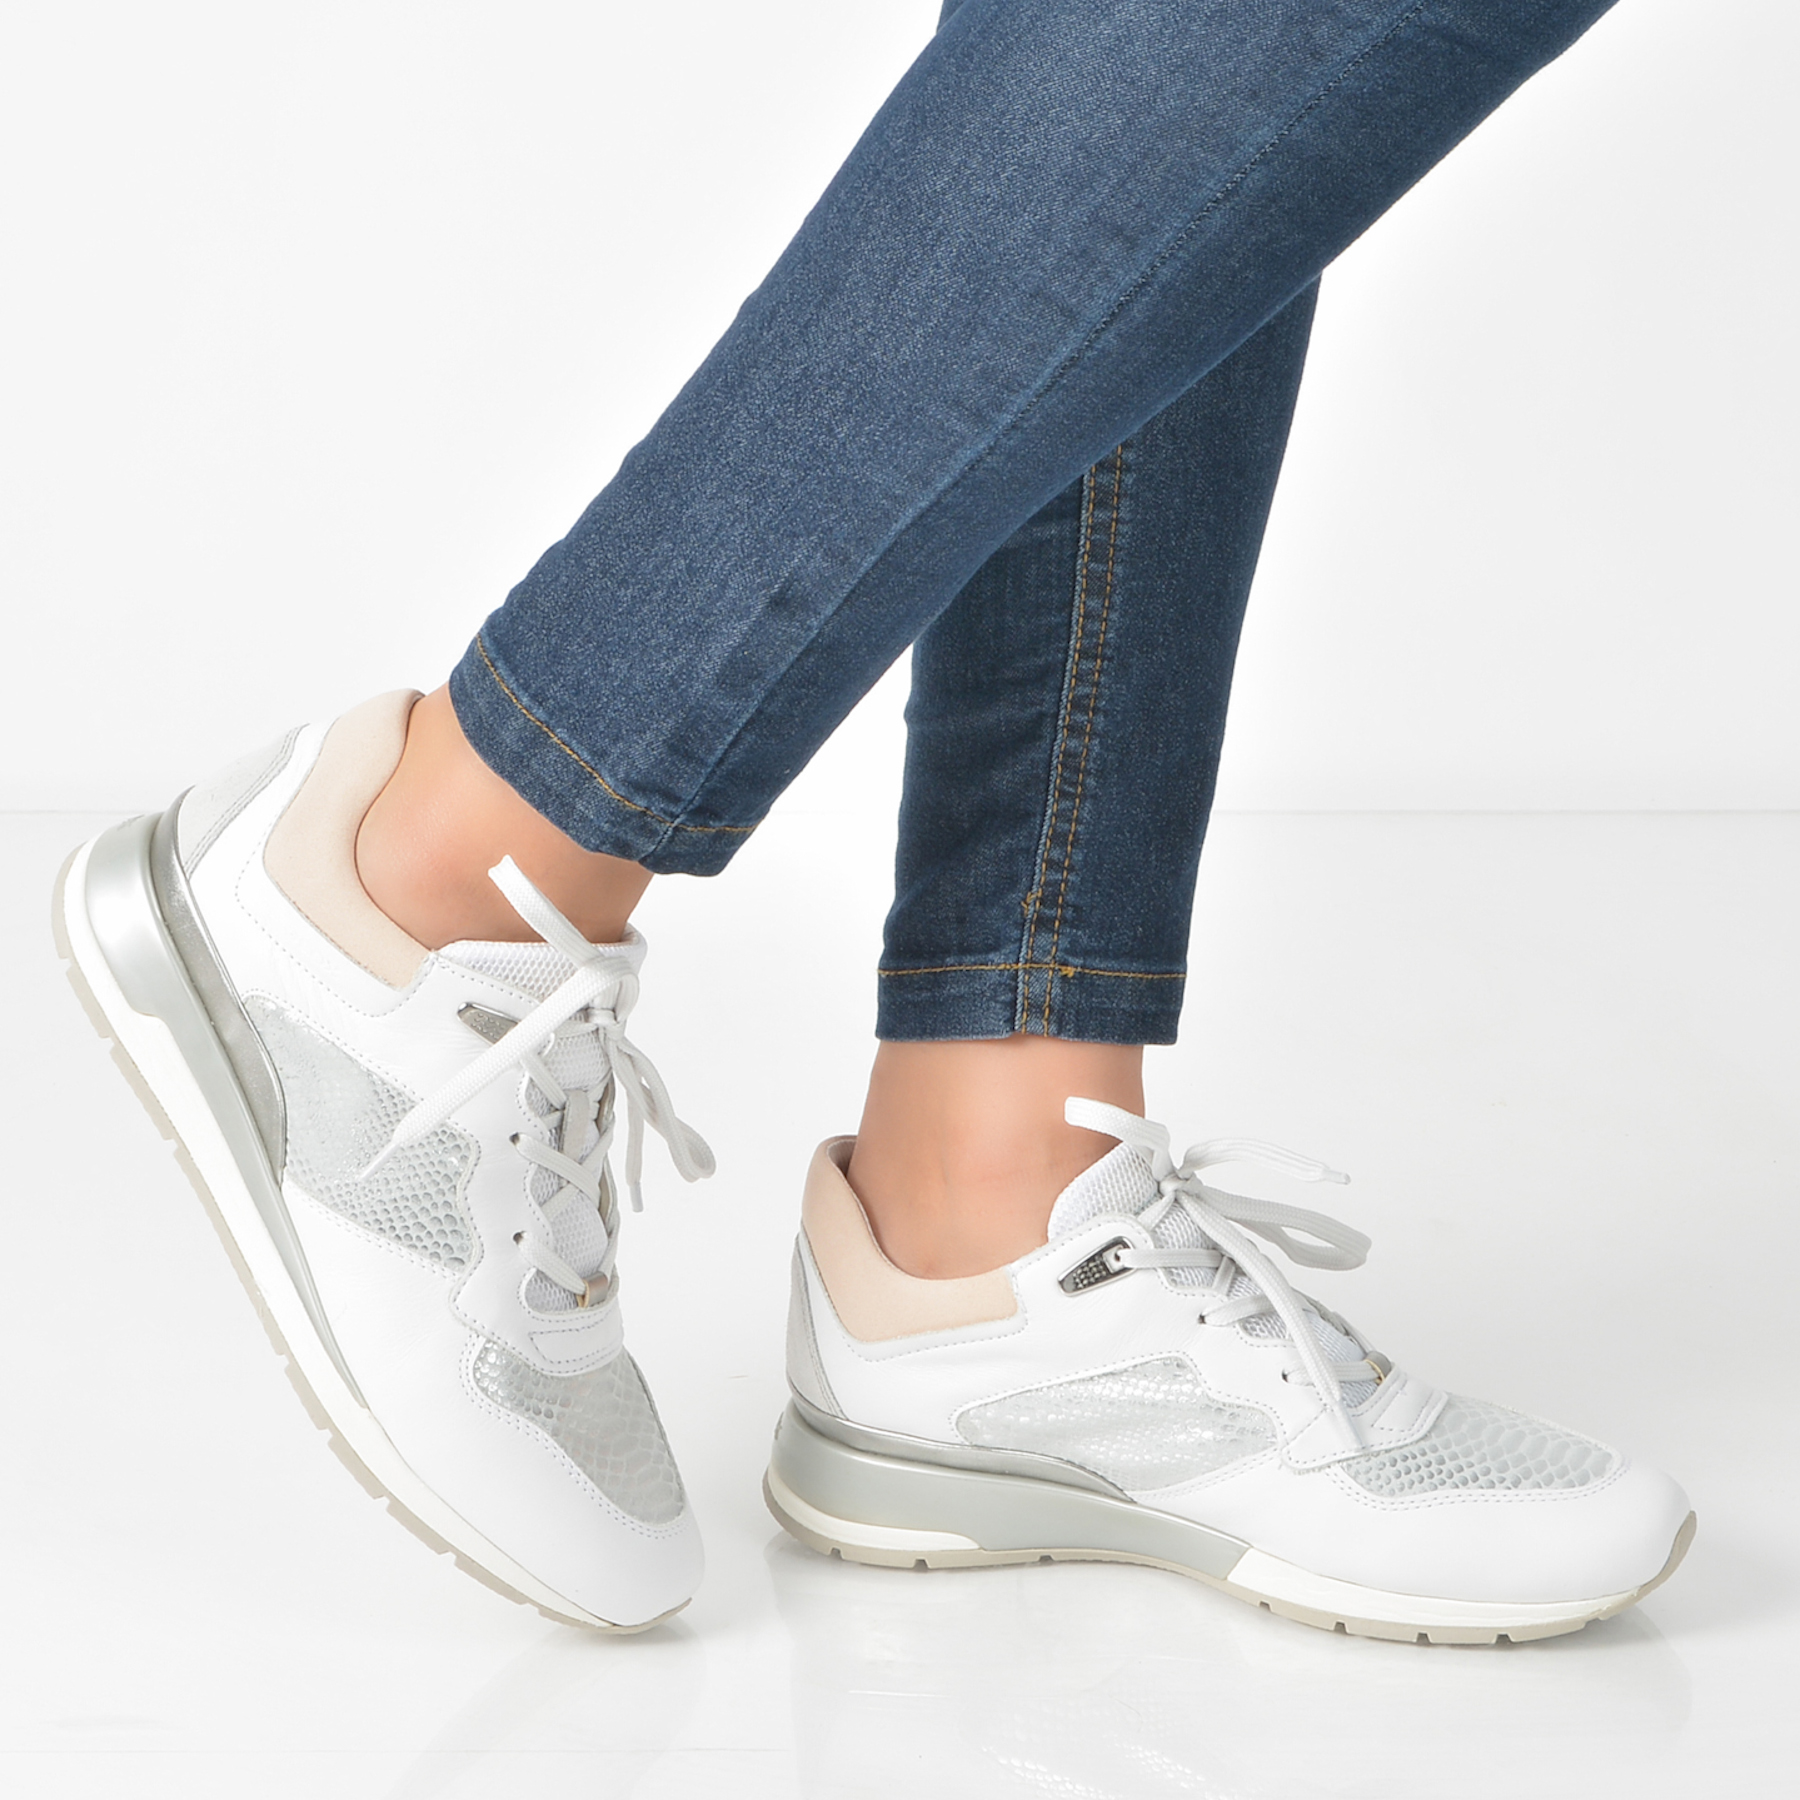 Pantofi Sport Geox Albi, D62n1b, Din Piele Naturala